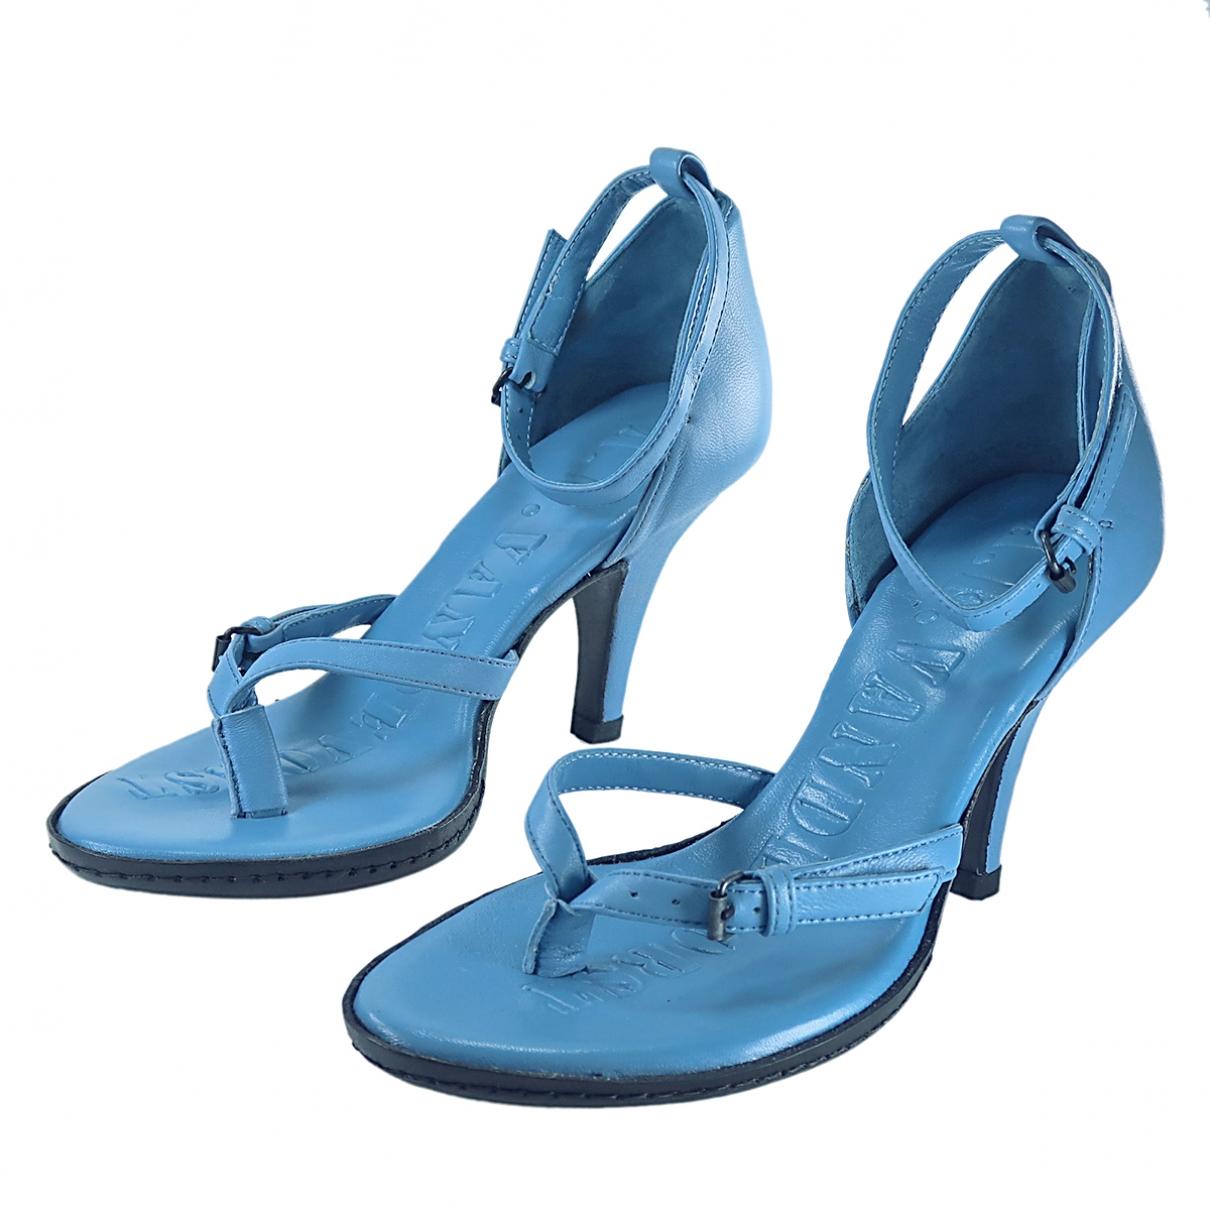 A.f.vandevorst - Sandales   pour femme en cuir - bleu